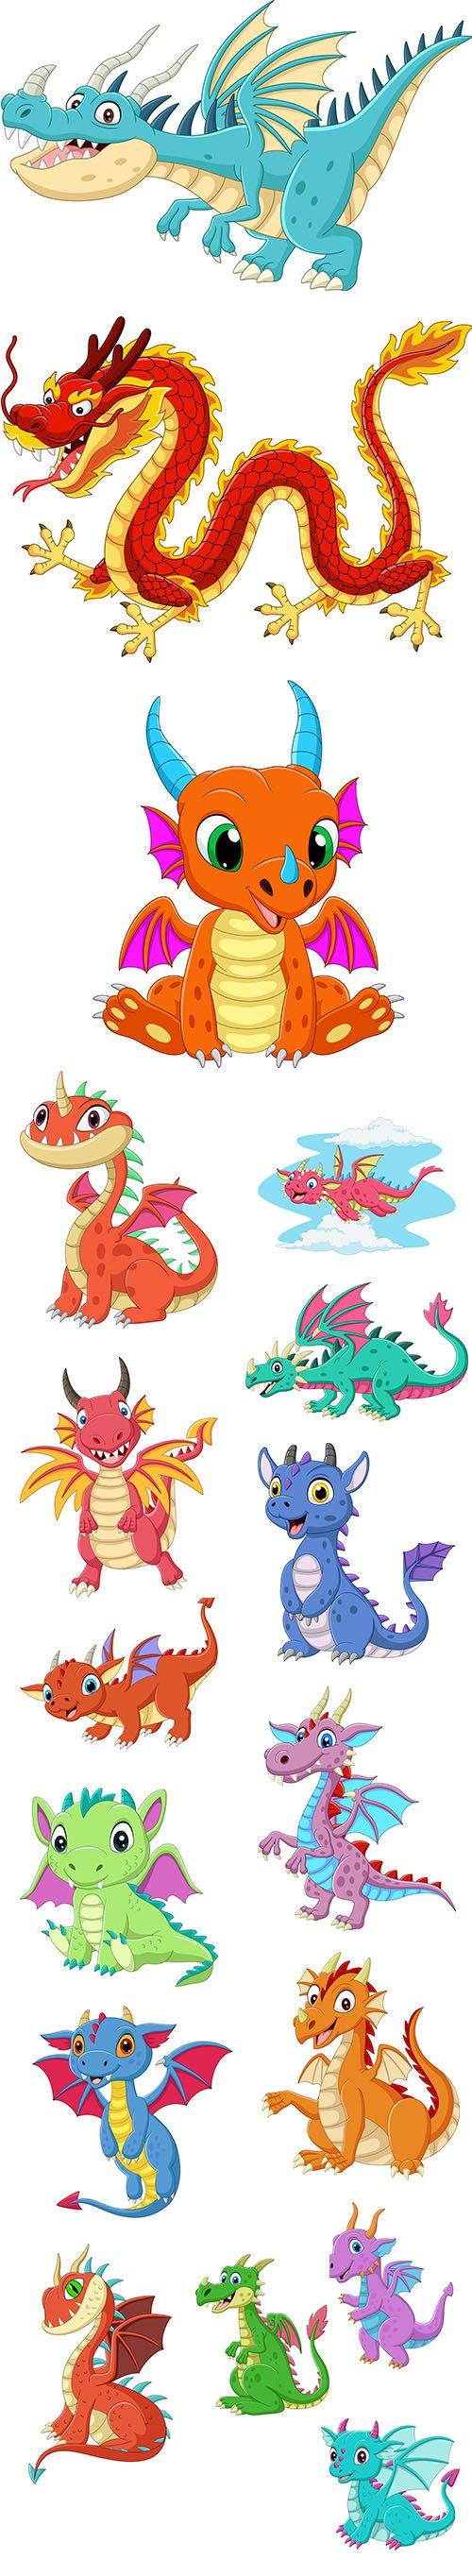 Cartoon Baby Dragon Set